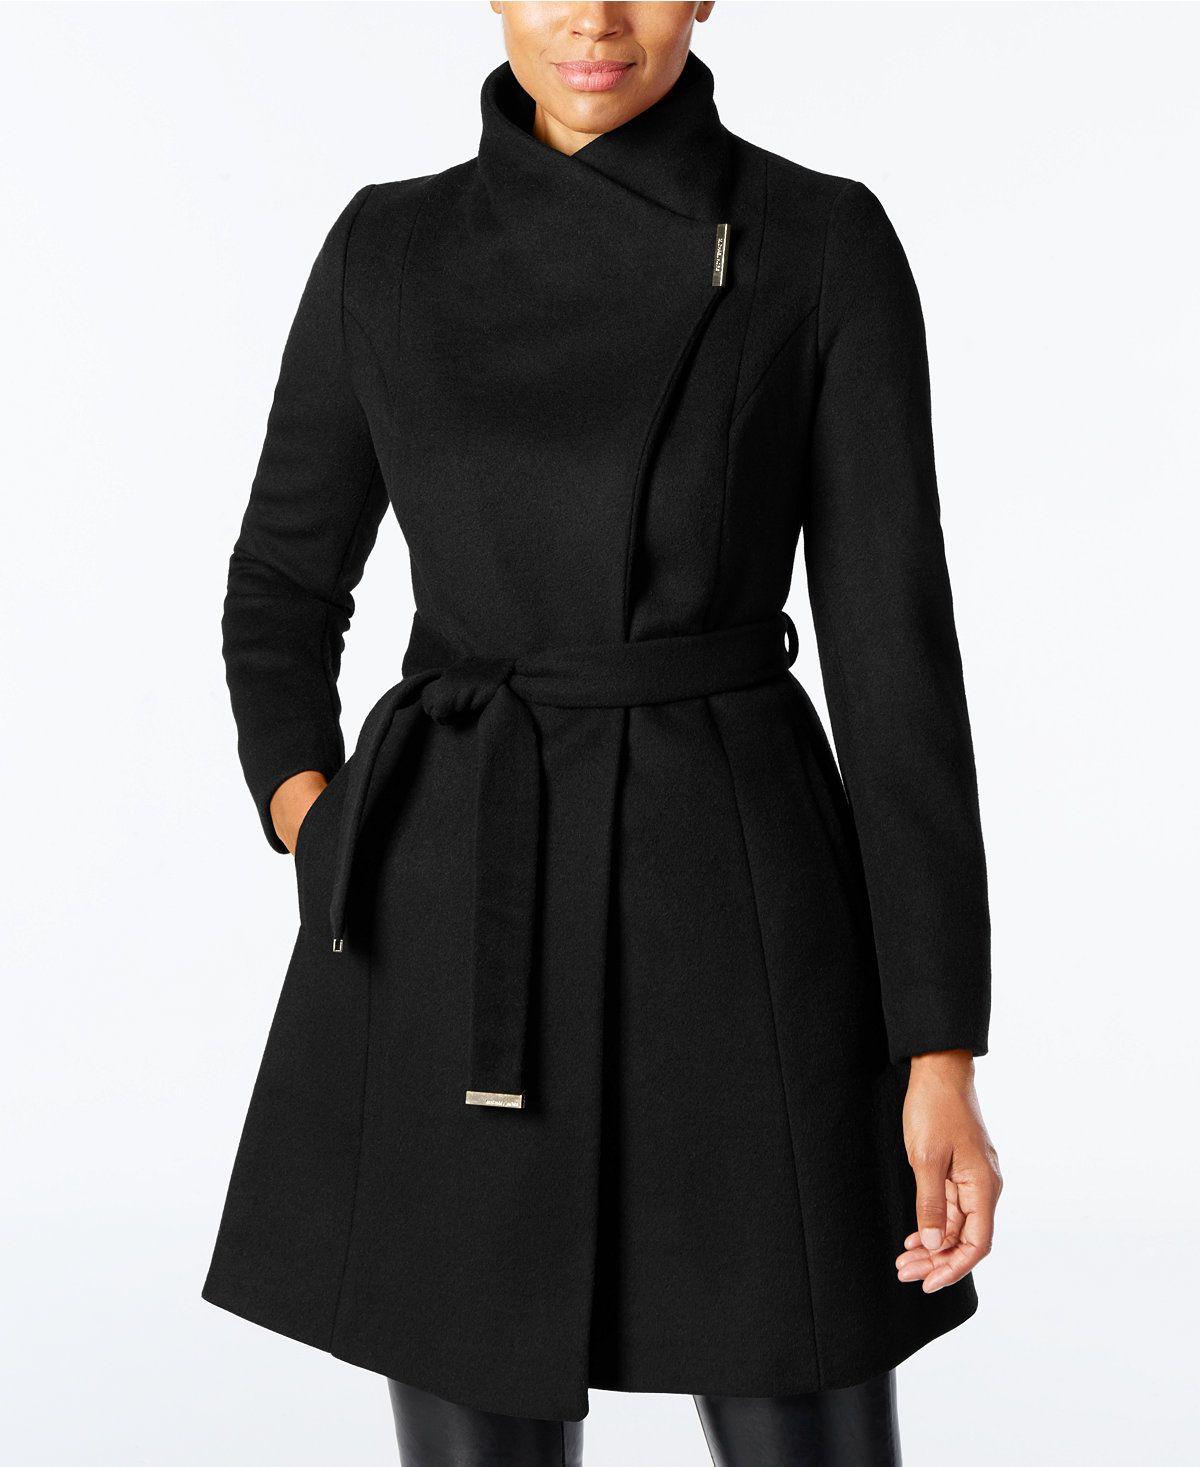 Michael Michael Kors Wool Blend Belted Walker Coat Coats Women Macy S Coats For Women Womens Dress Coats Fashion [ 1467 x 1200 Pixel ]